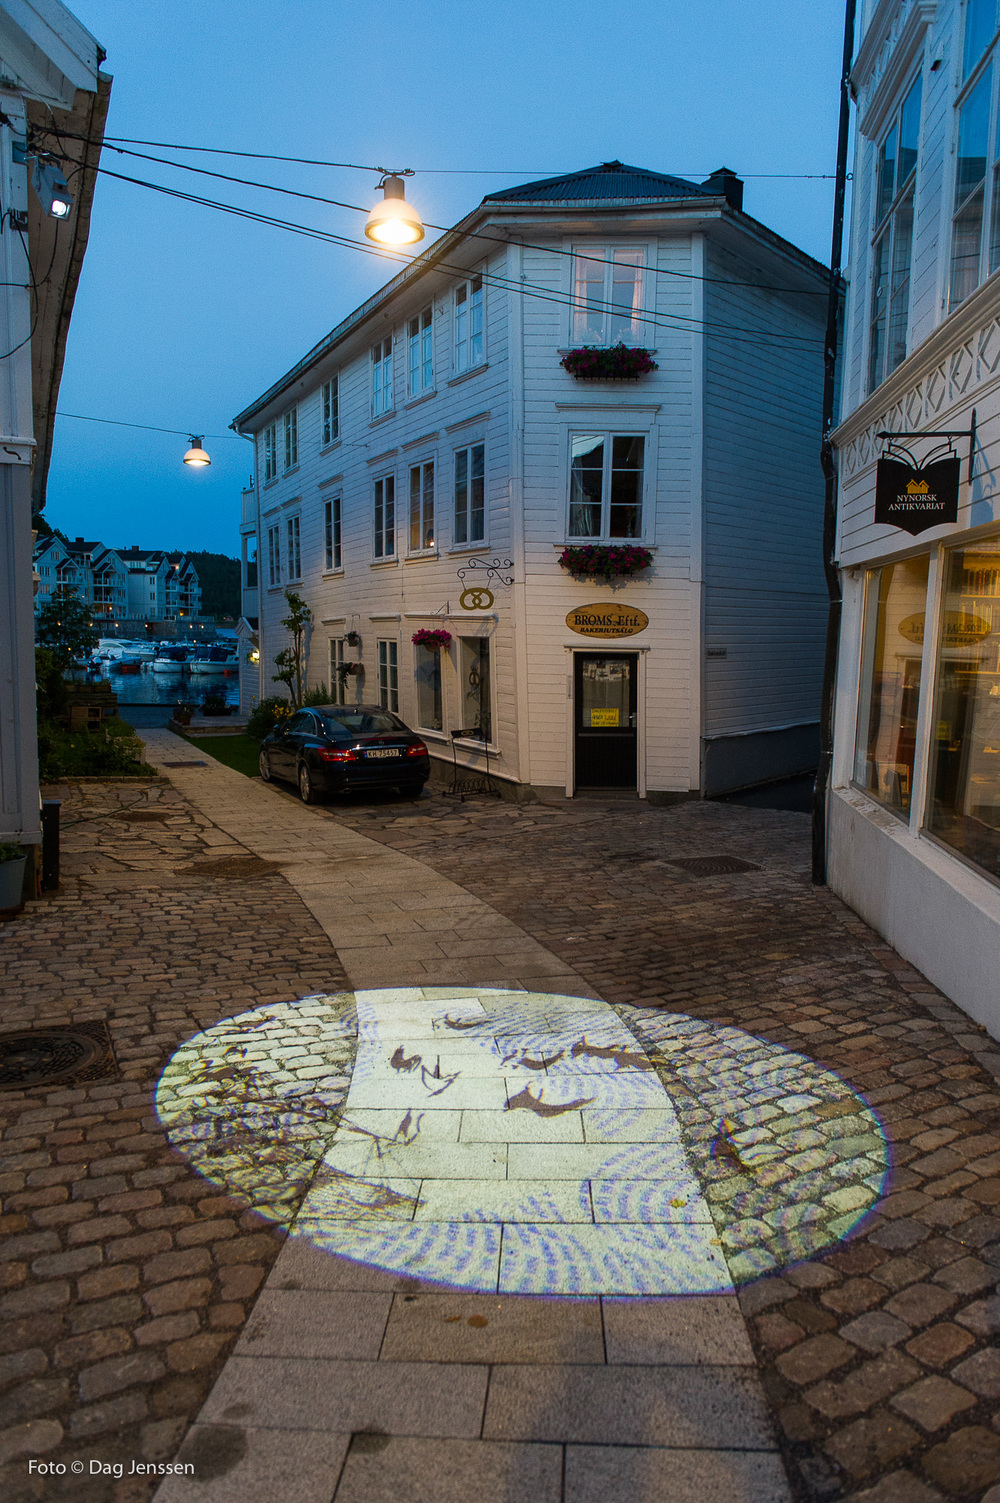 20160621-tvedestrand-0995-web.jpg